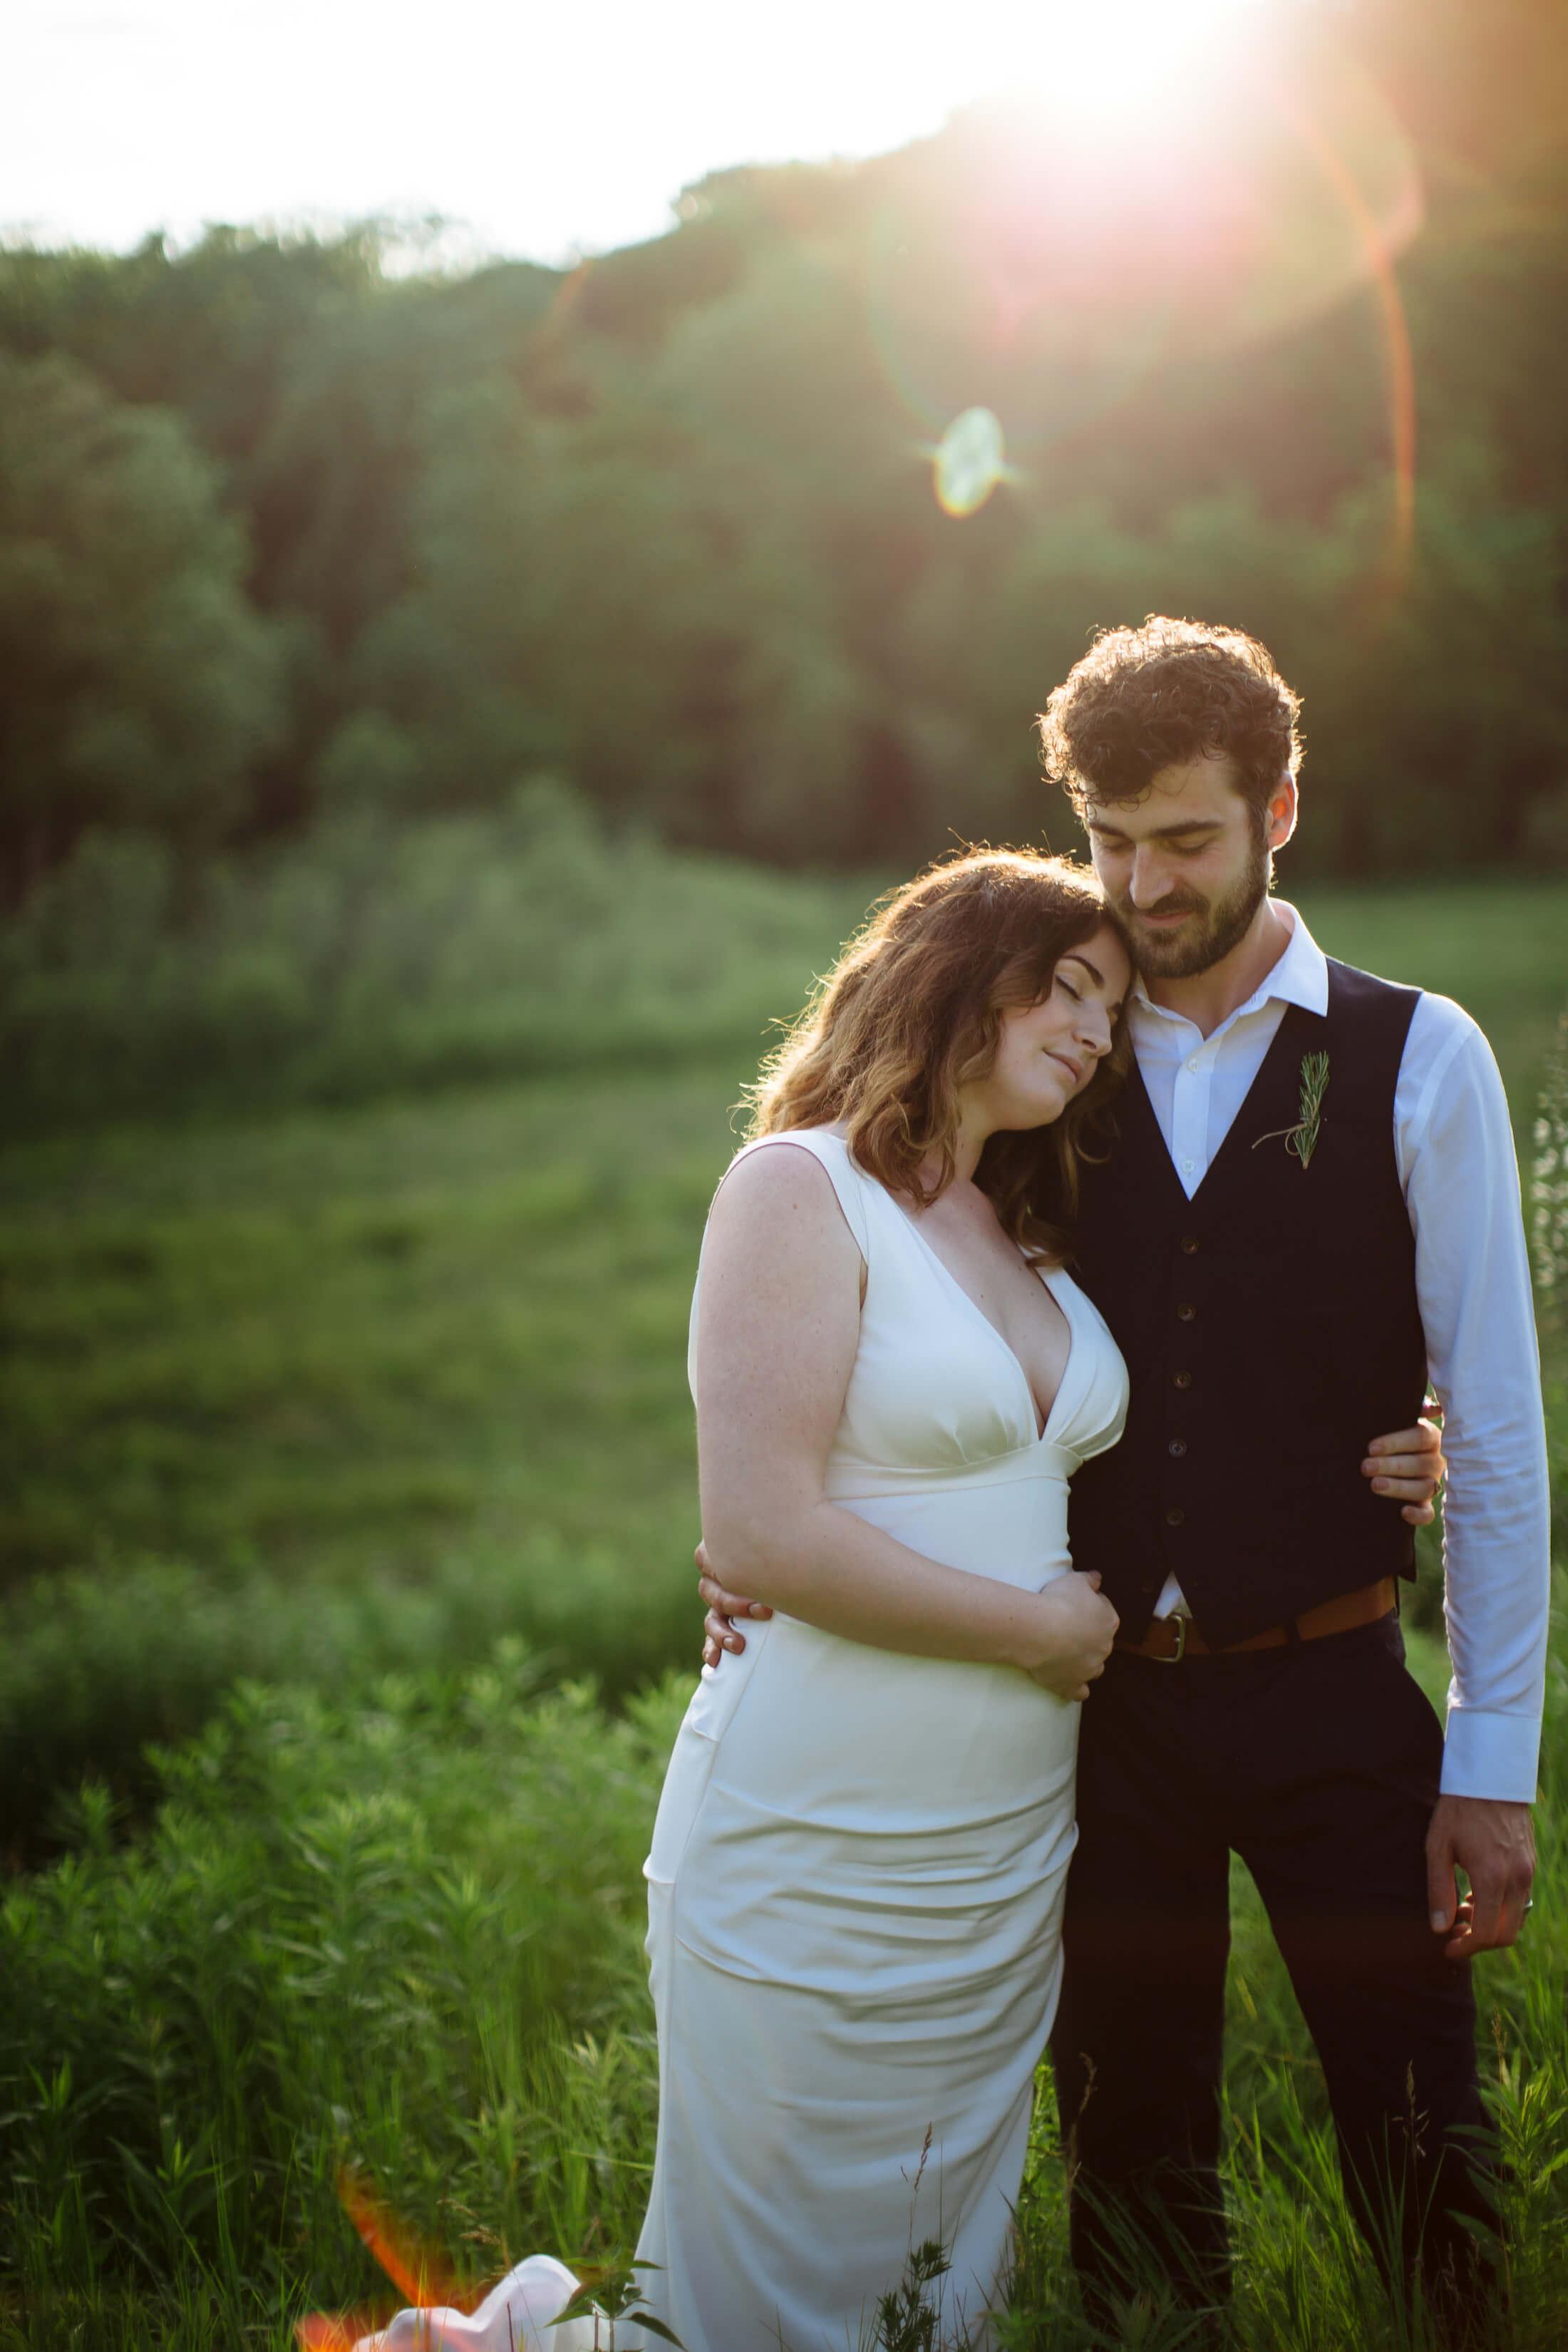 engle-olson-ray-kelly-photography-wisconsin-wedding-120.jpg